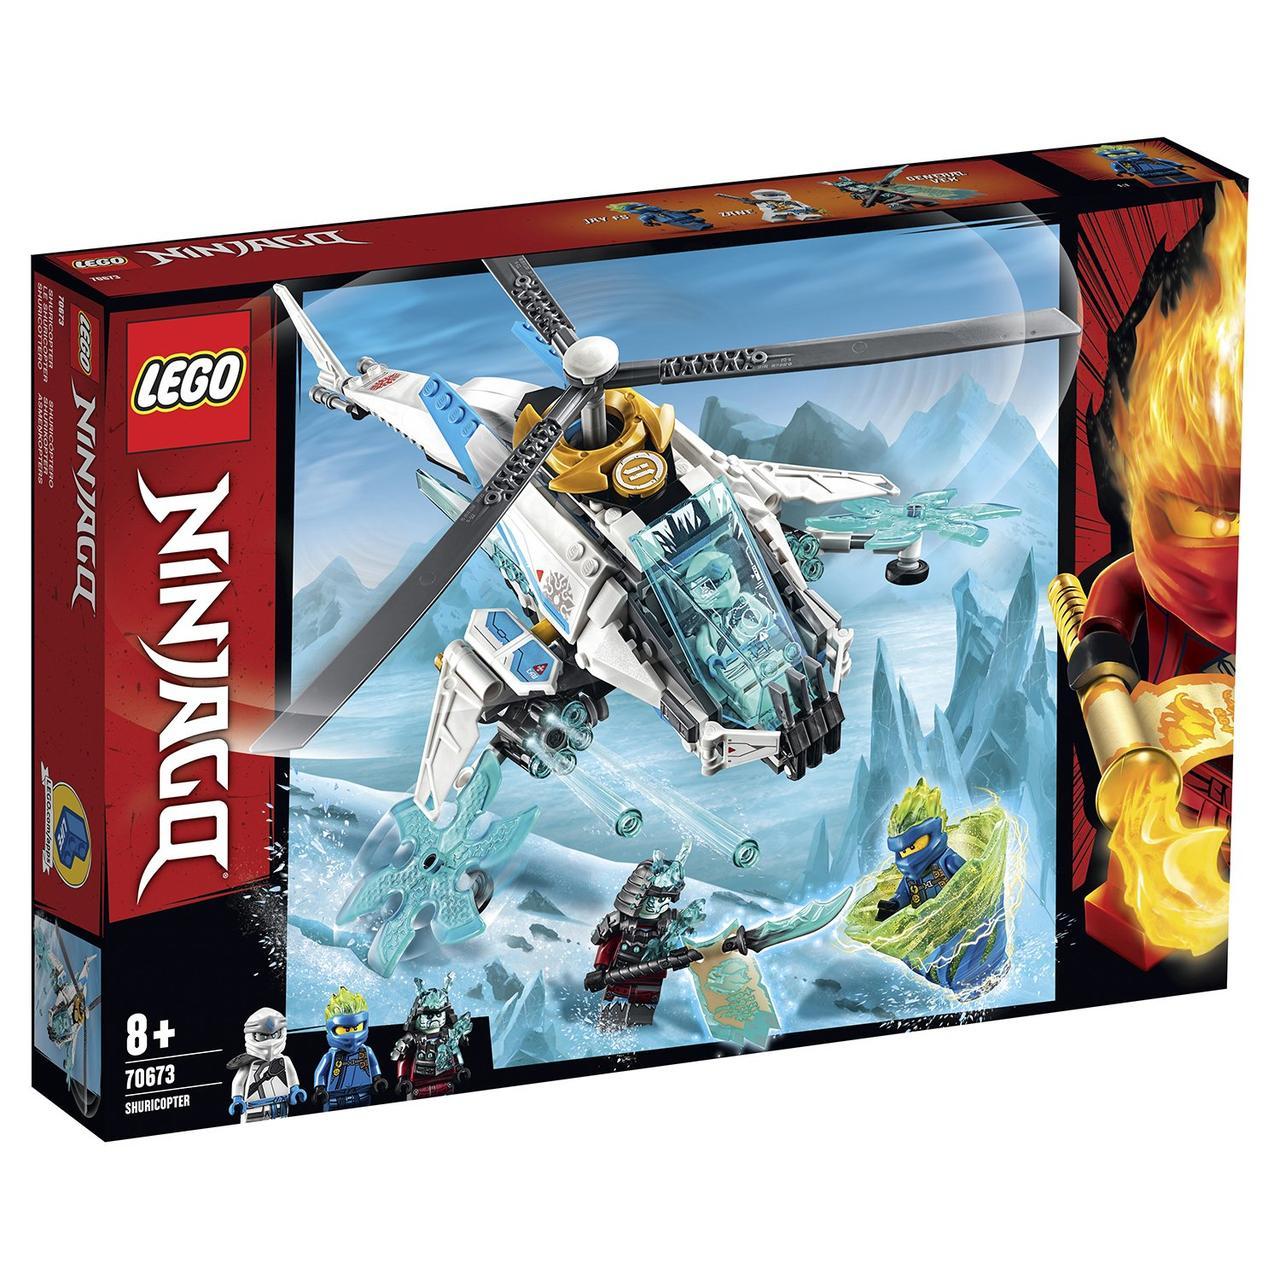 70673 Lego Ninjago Шурилёт, Лего Ниндзяго